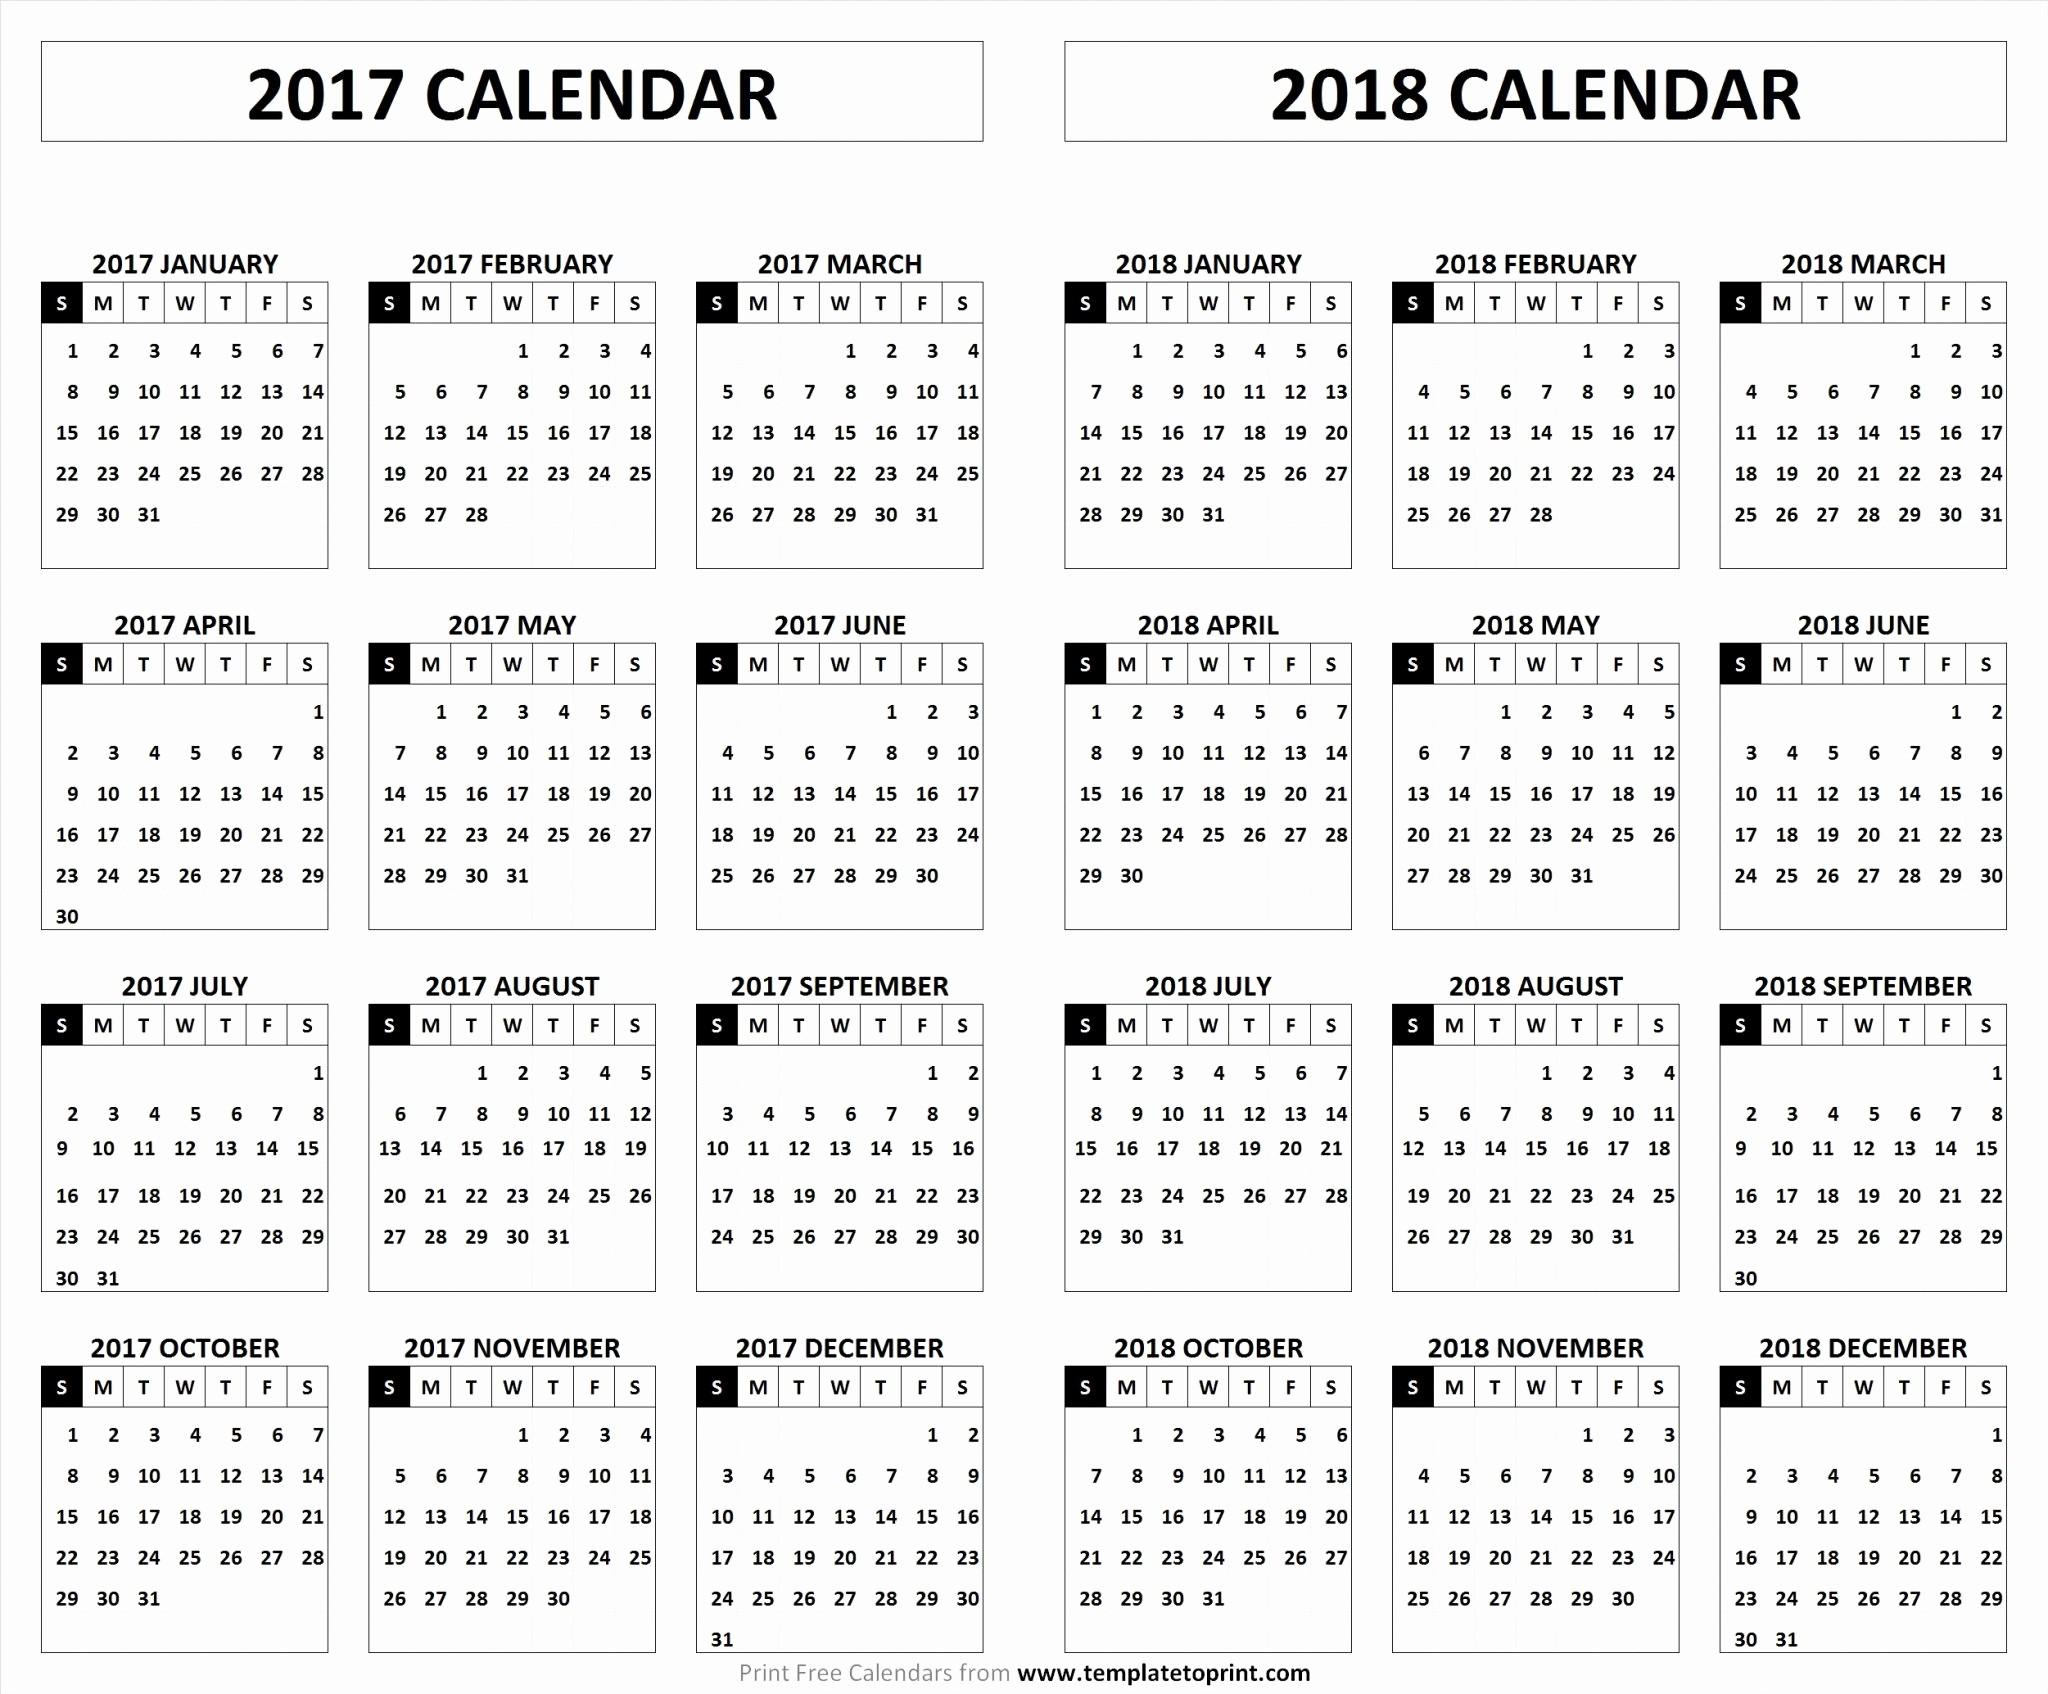 2017-2018 Printable Calendar Beautiful 2017 2018 Calendar Printable Template Pdf